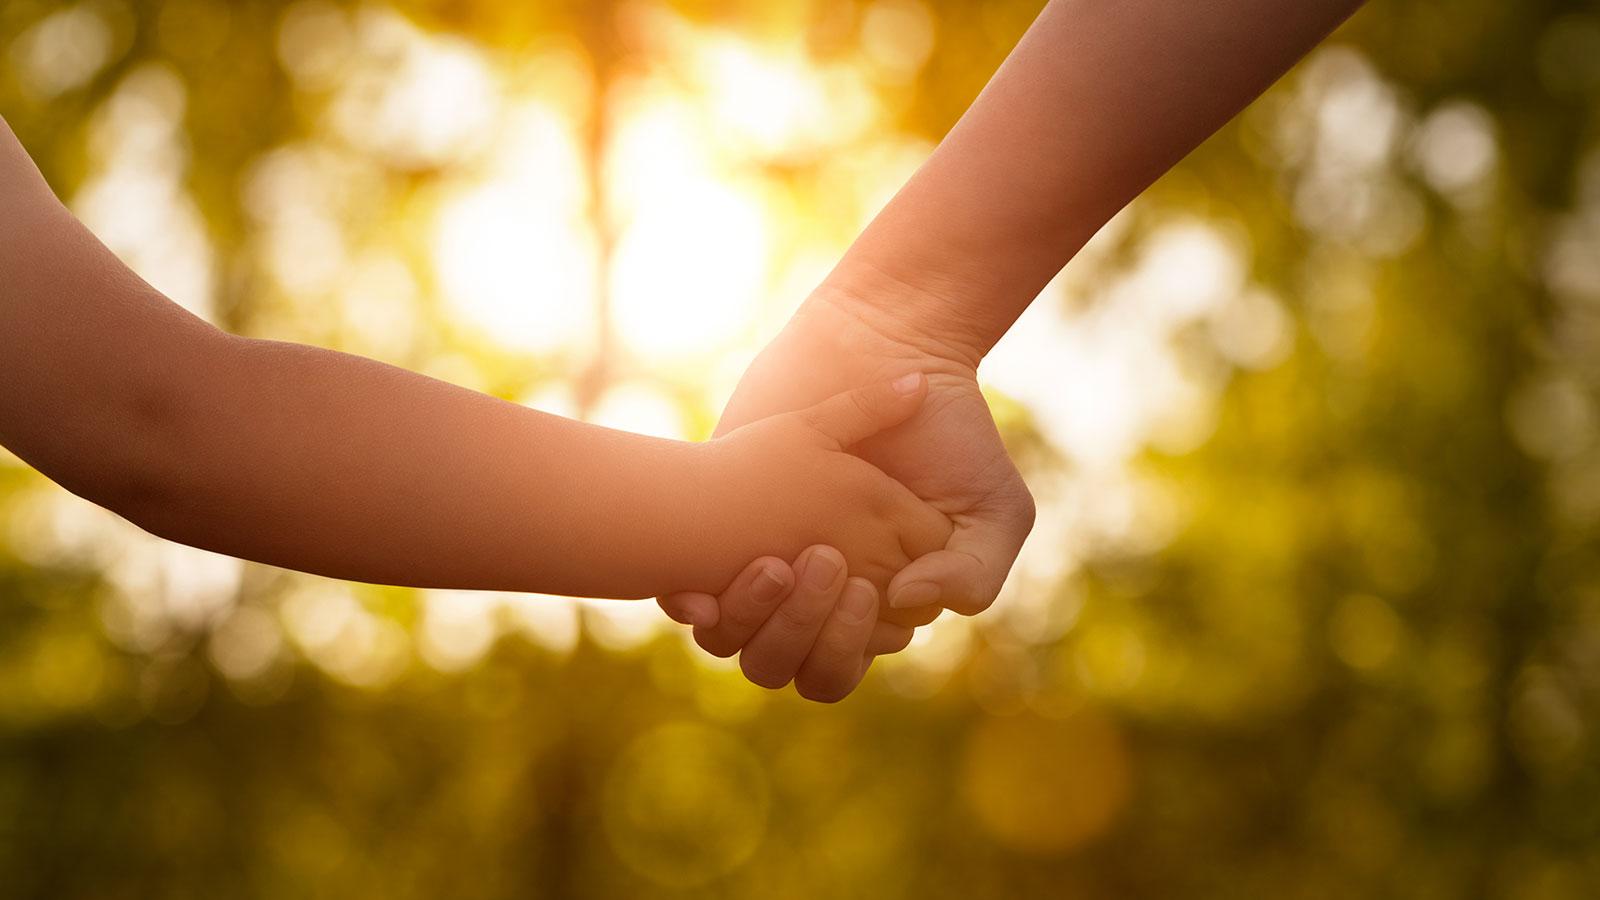 Holding hands sunlight through trees